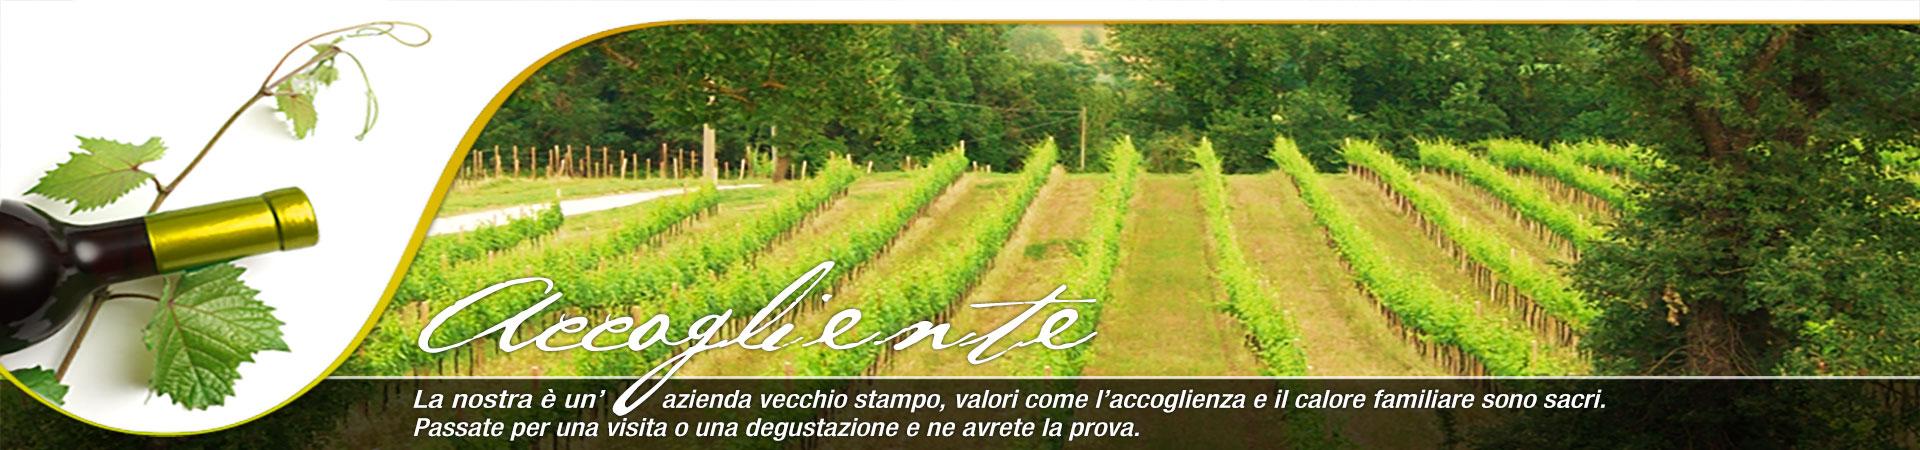 Cantina Zazzera – Vigne – Vini – Collevalenza – Todi (Perugia) (Umbria)